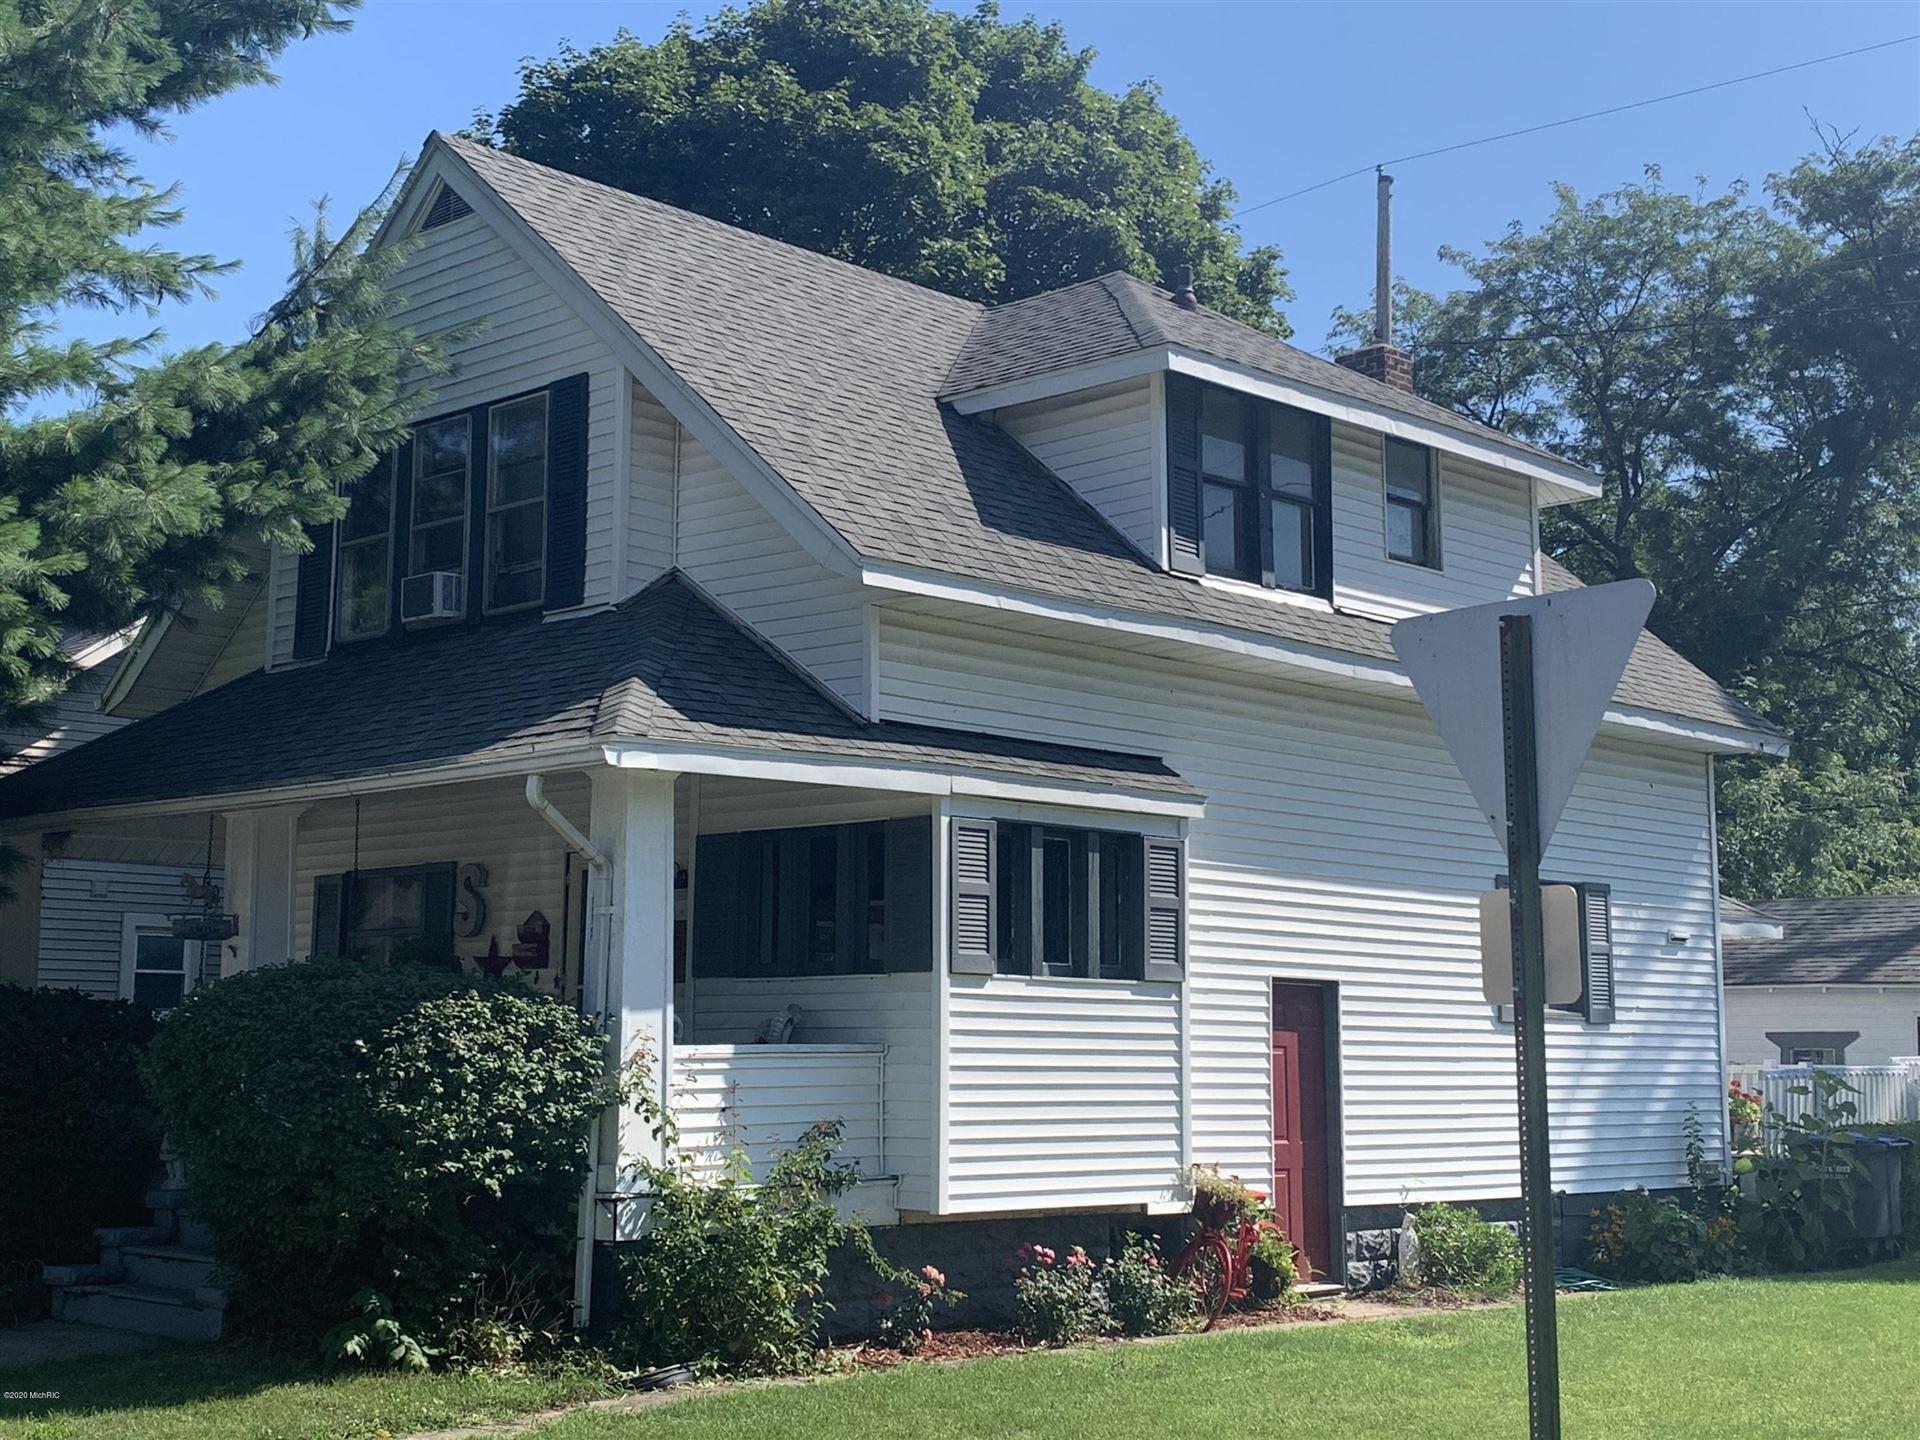 114 Virginia Avenue, Sturgis, MI 49091 - #: 20031701